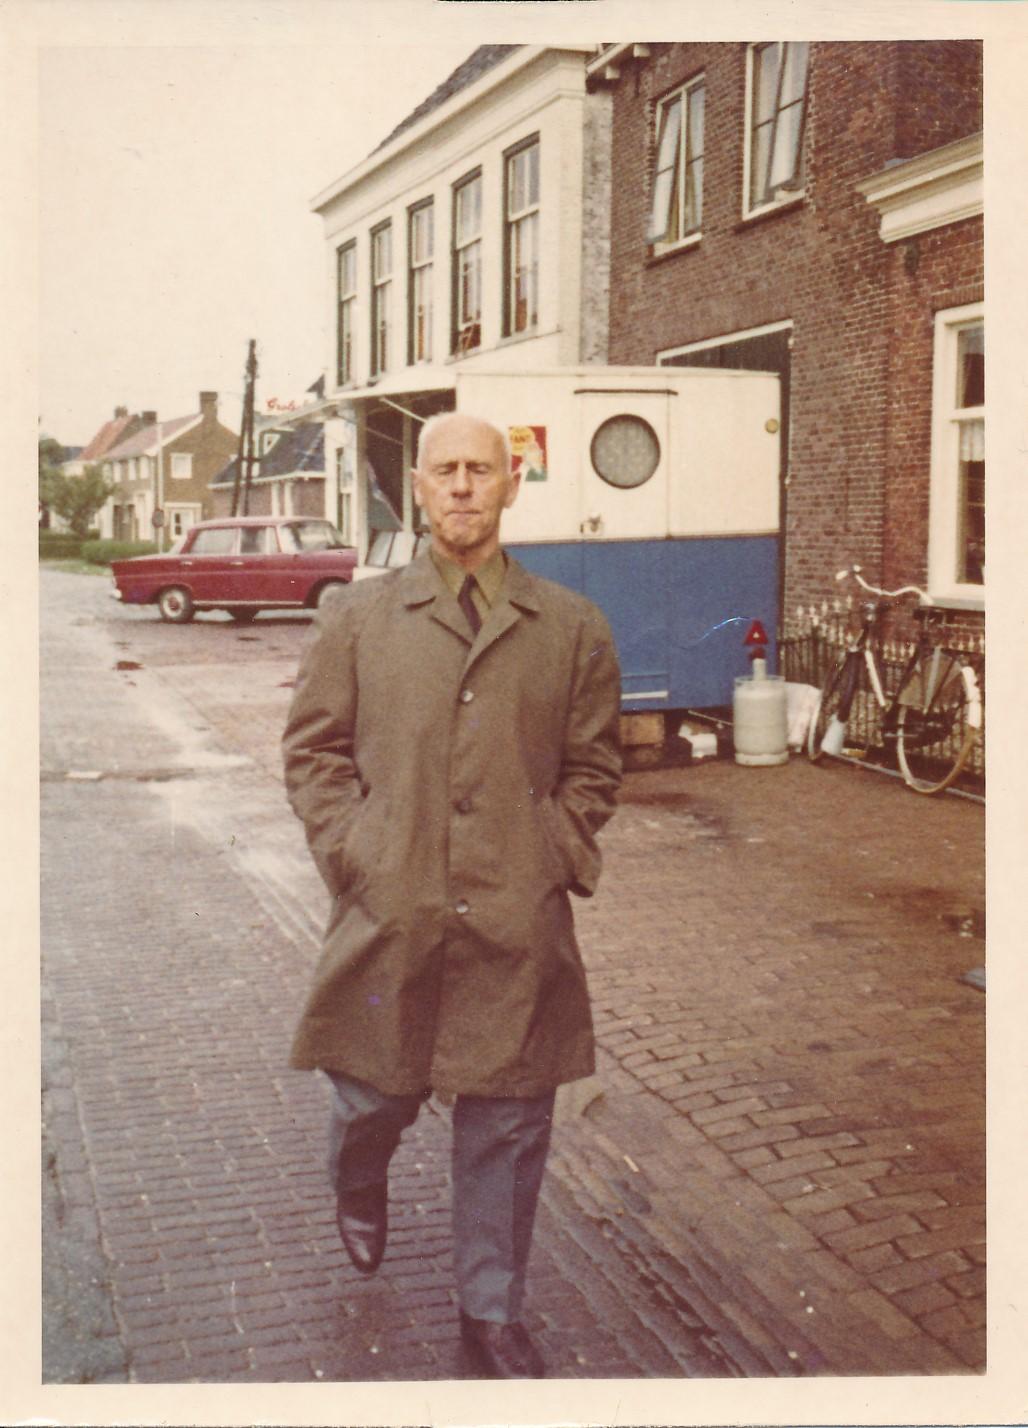 Fotoalbum Andre Kamsma, 143, Merke Bauke Kamsma, 1980